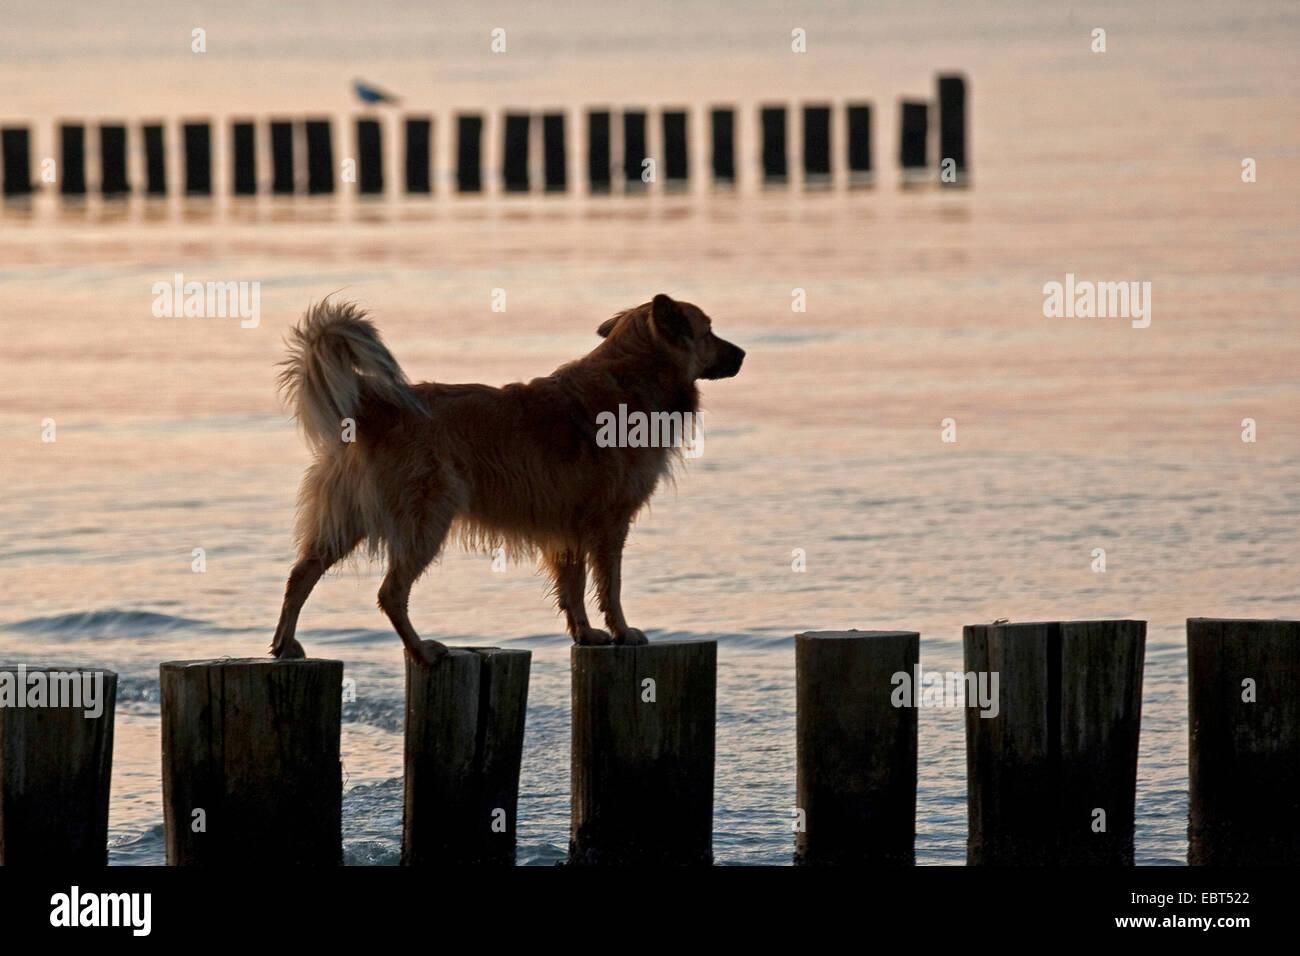 dog balancing on spur dikes, Germany, Mecklenburg-Western Pomerania, Zingst - Stock Image